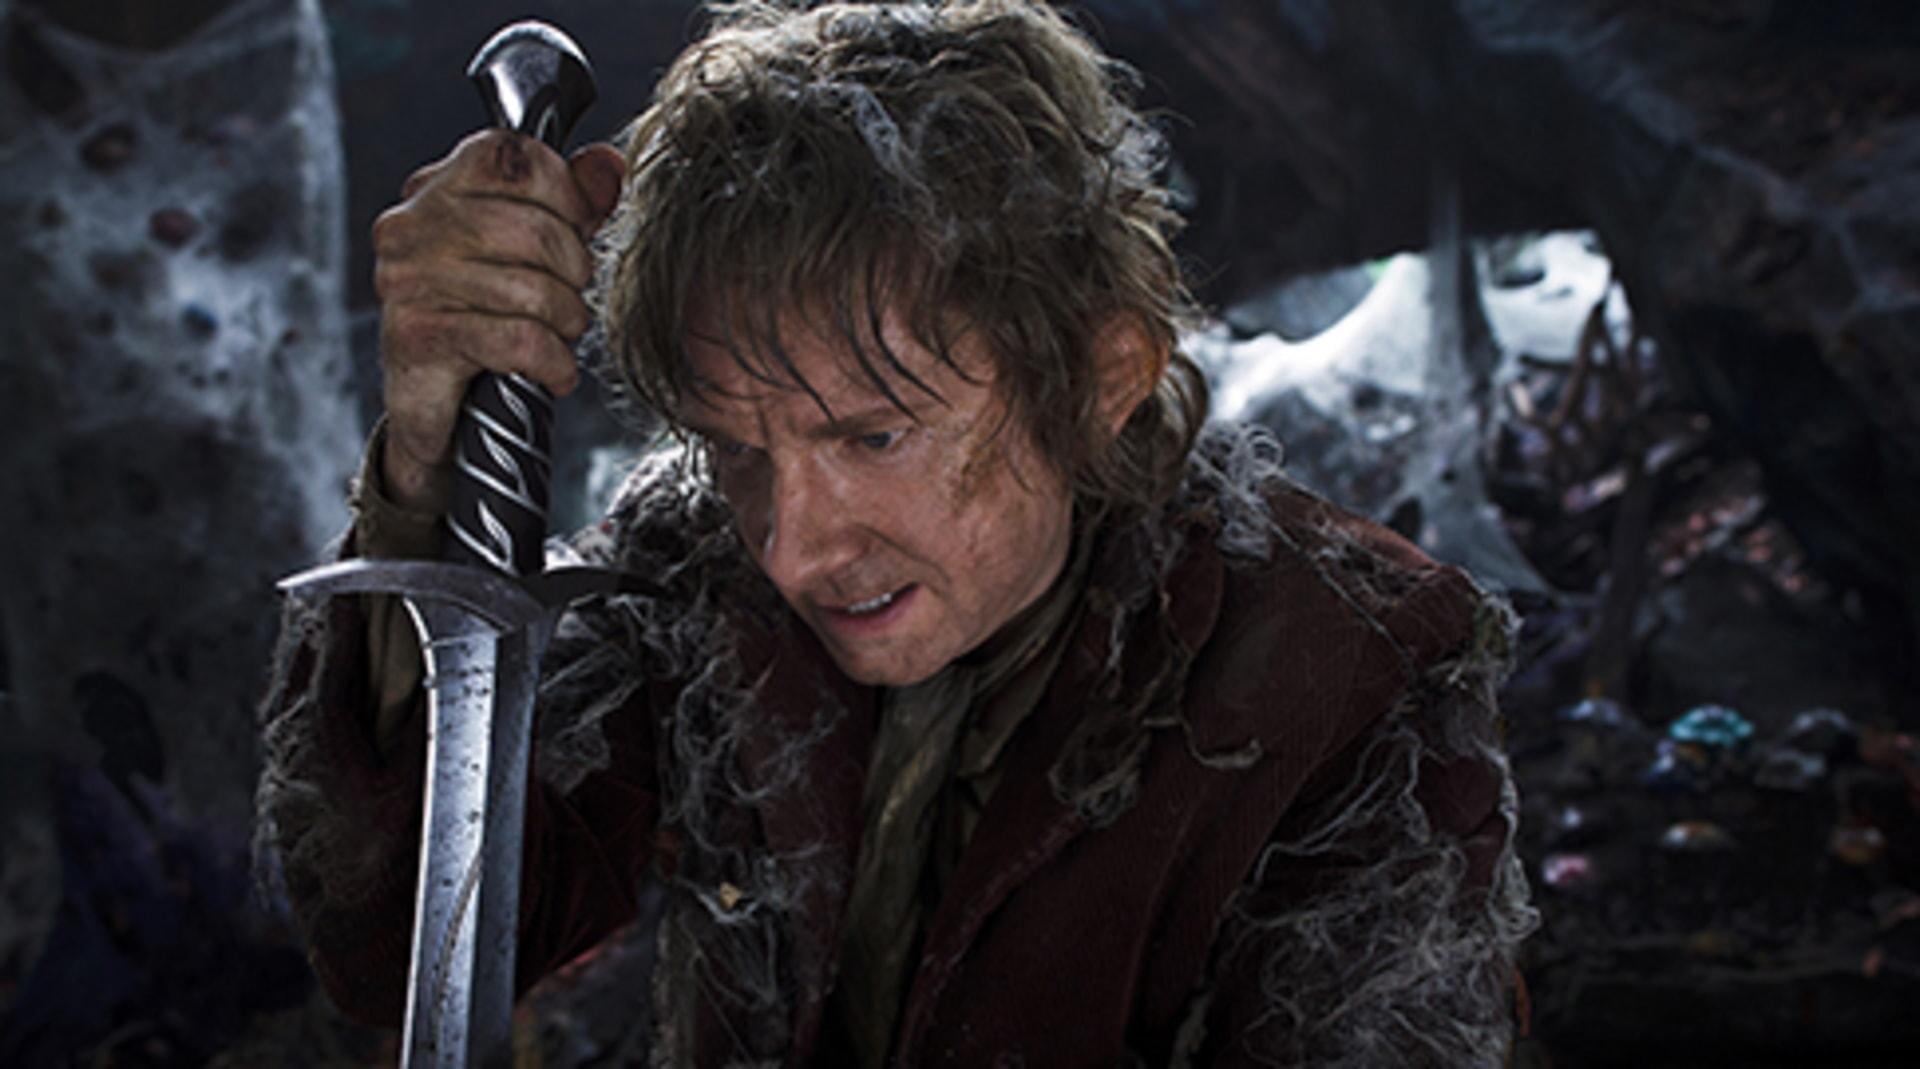 The Hobbit: The Desolation of Smaug - Image 1